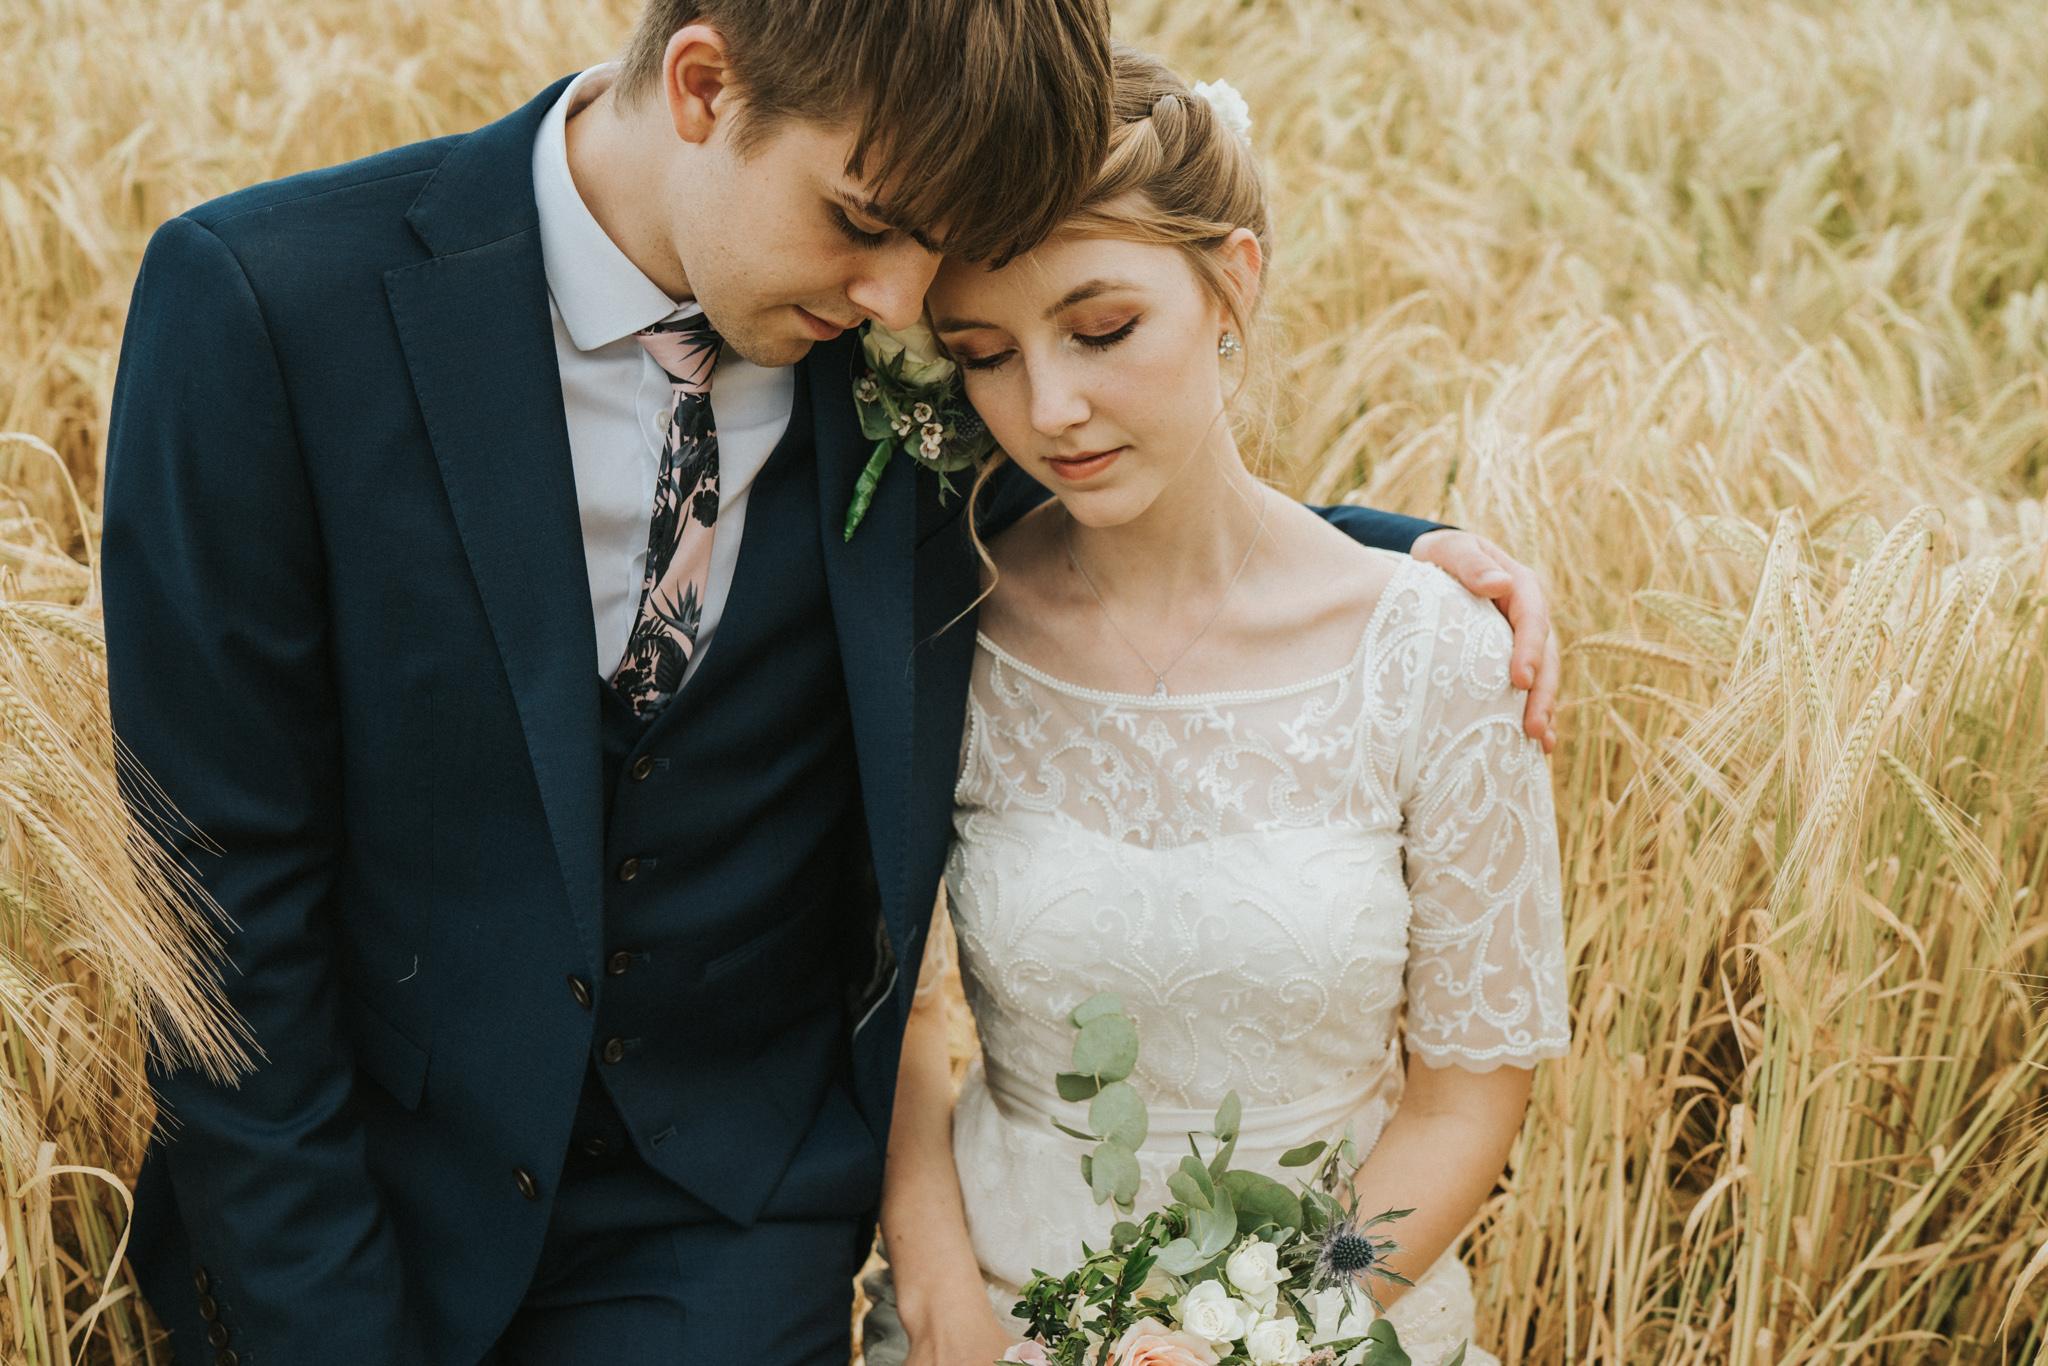 Jess-and-Tom-Norfolk-Alternative-Wedding-Essex-Wedding-Photographer-Grace-Elizabeth-21.jpg